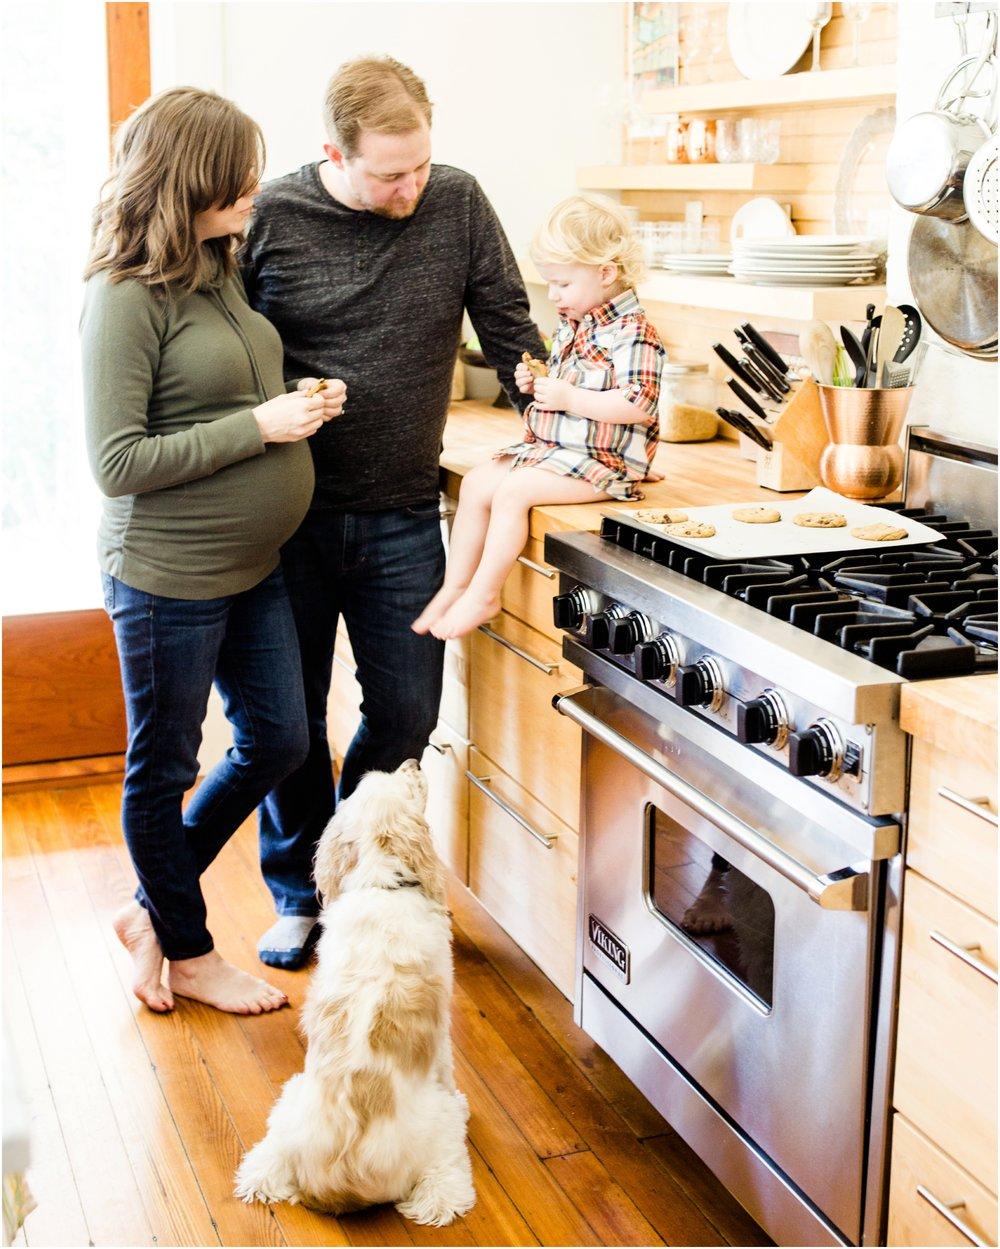 Hilfiger-Family-2017-November-029_quaint-and-whim-lifestyle-photographer-louisiana-.jpg